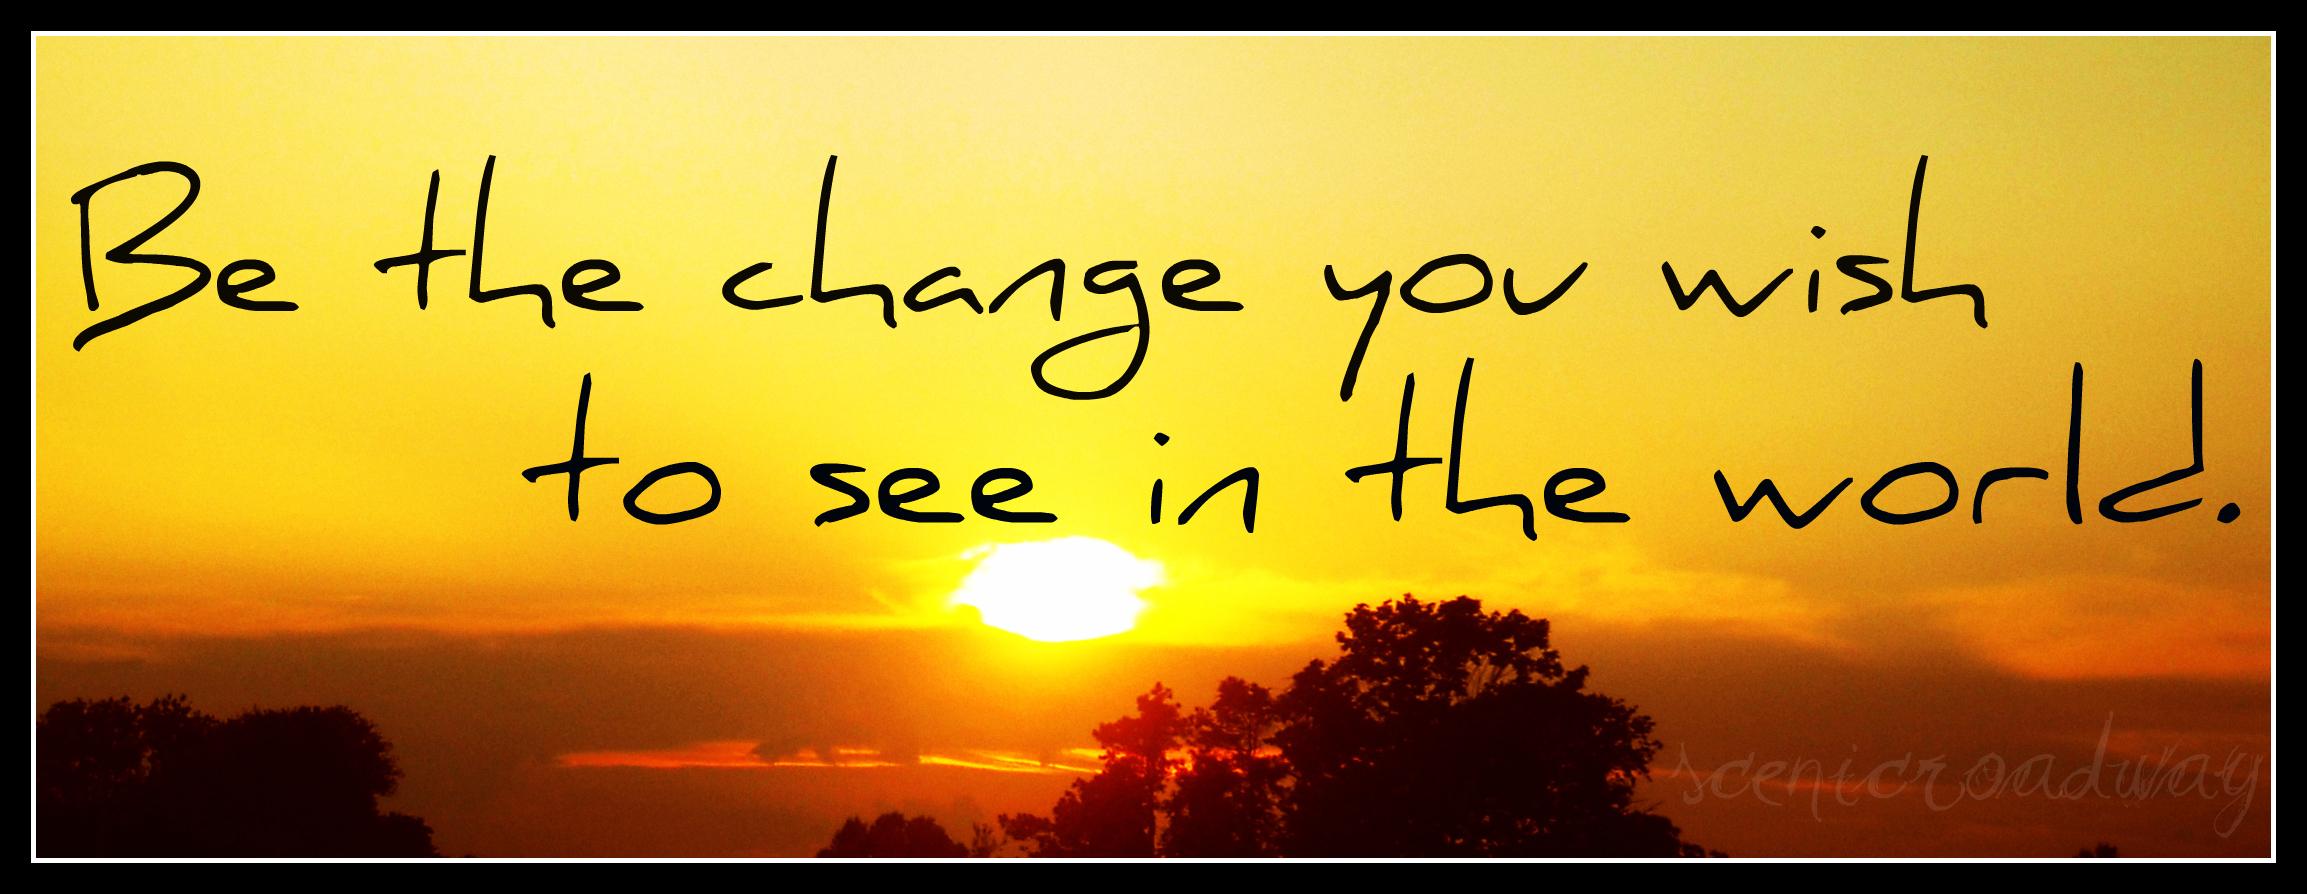 Spiritual Quotes On Change. QuotesGram